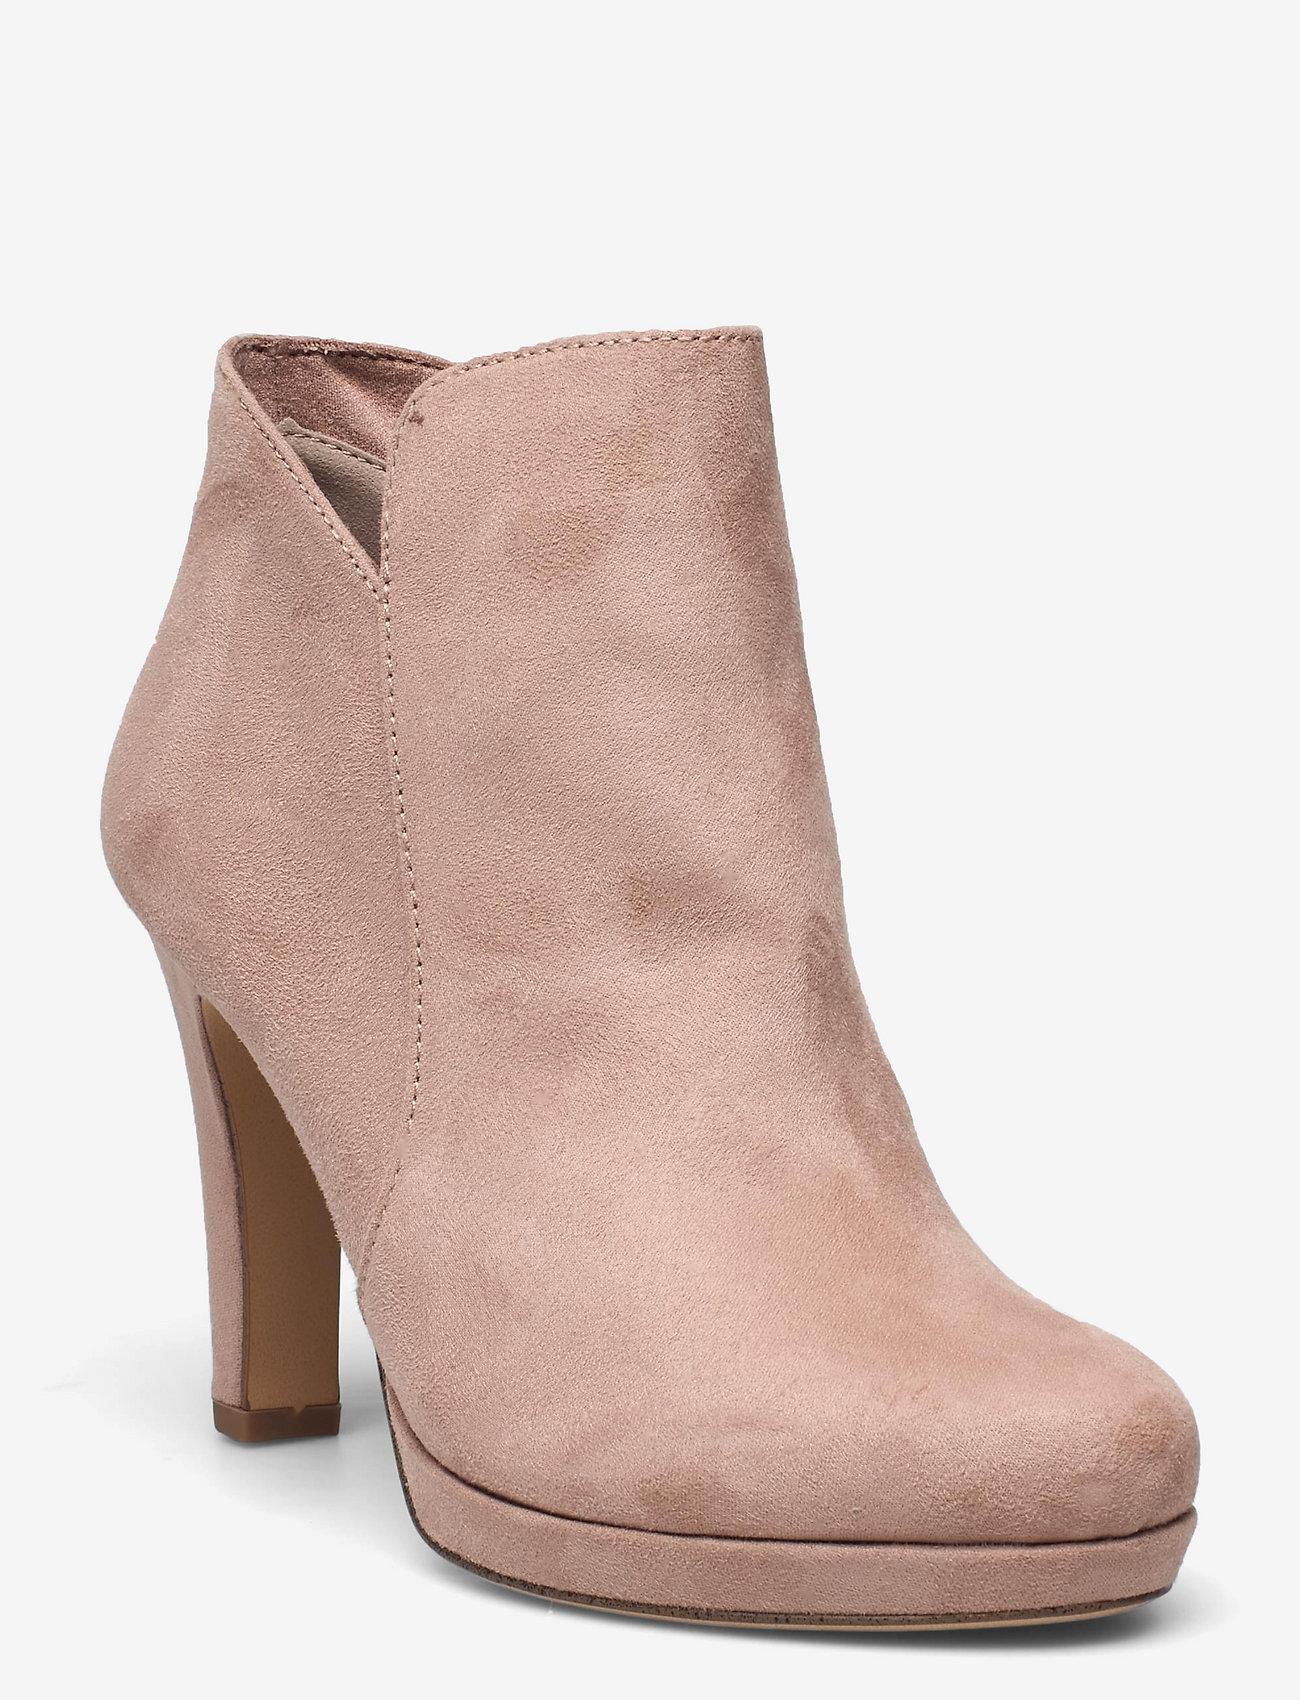 Tamaris - Woms Boots - Lycoris - augstpapēžu puszābaki - old rose - 0